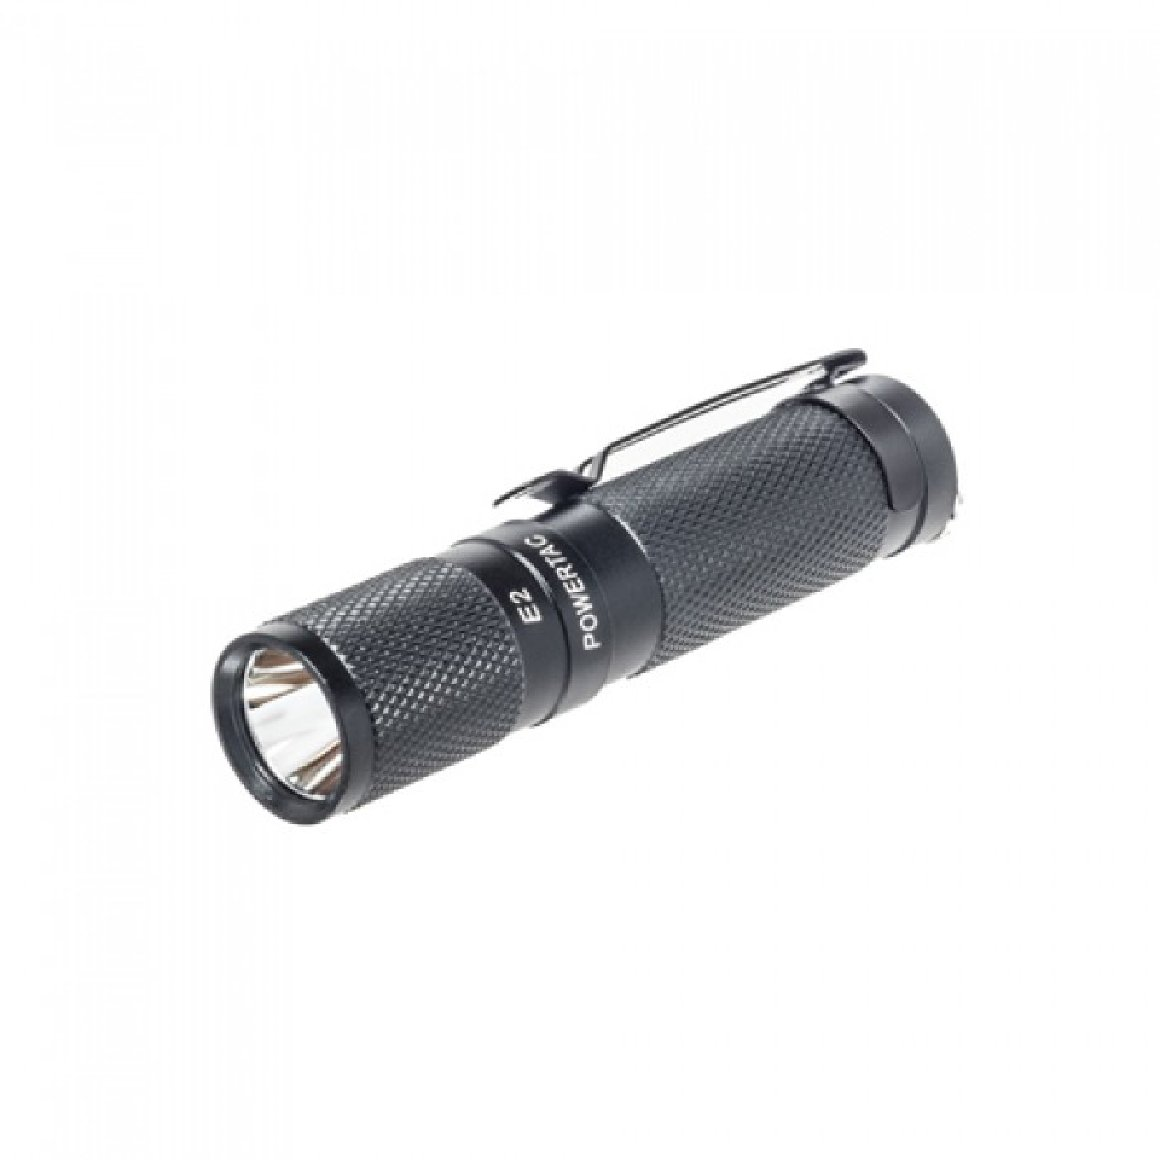 Powertac E2 LED Schlüsselanhänger mit XP-G R5 LED 115 Lumen